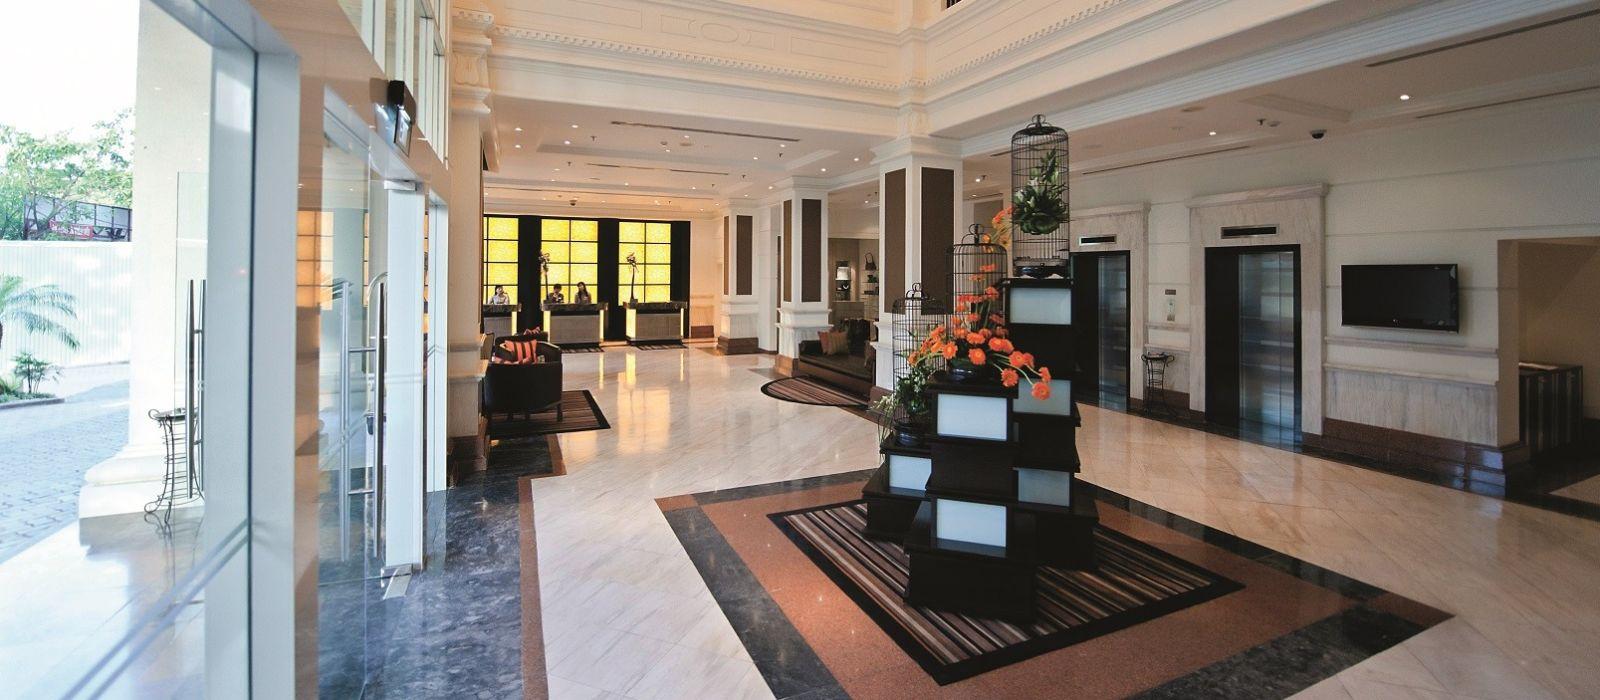 Hotel Movenpick  (Hanoi) Vietnam